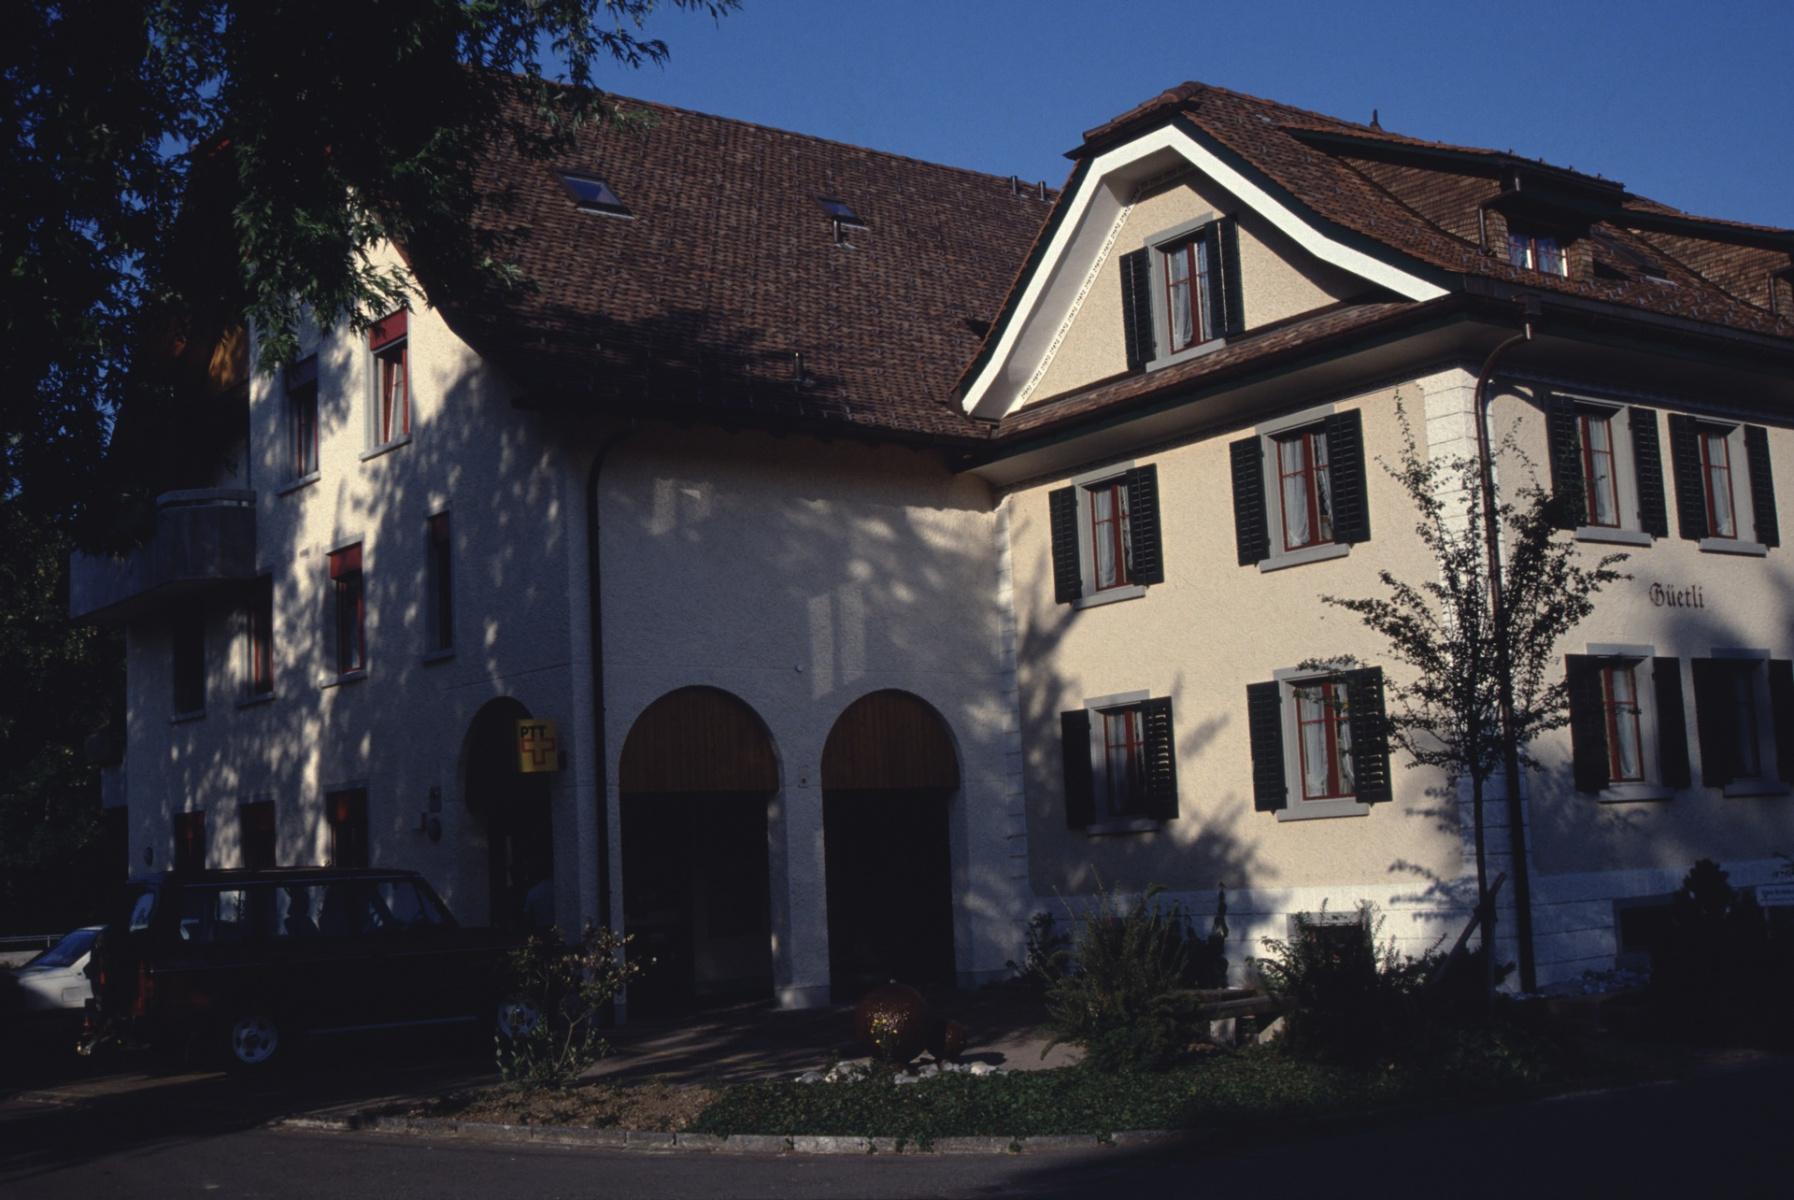 Güetli-Post ca 1990 (der Anbau der Post ans Güetli erfolgte 1987)